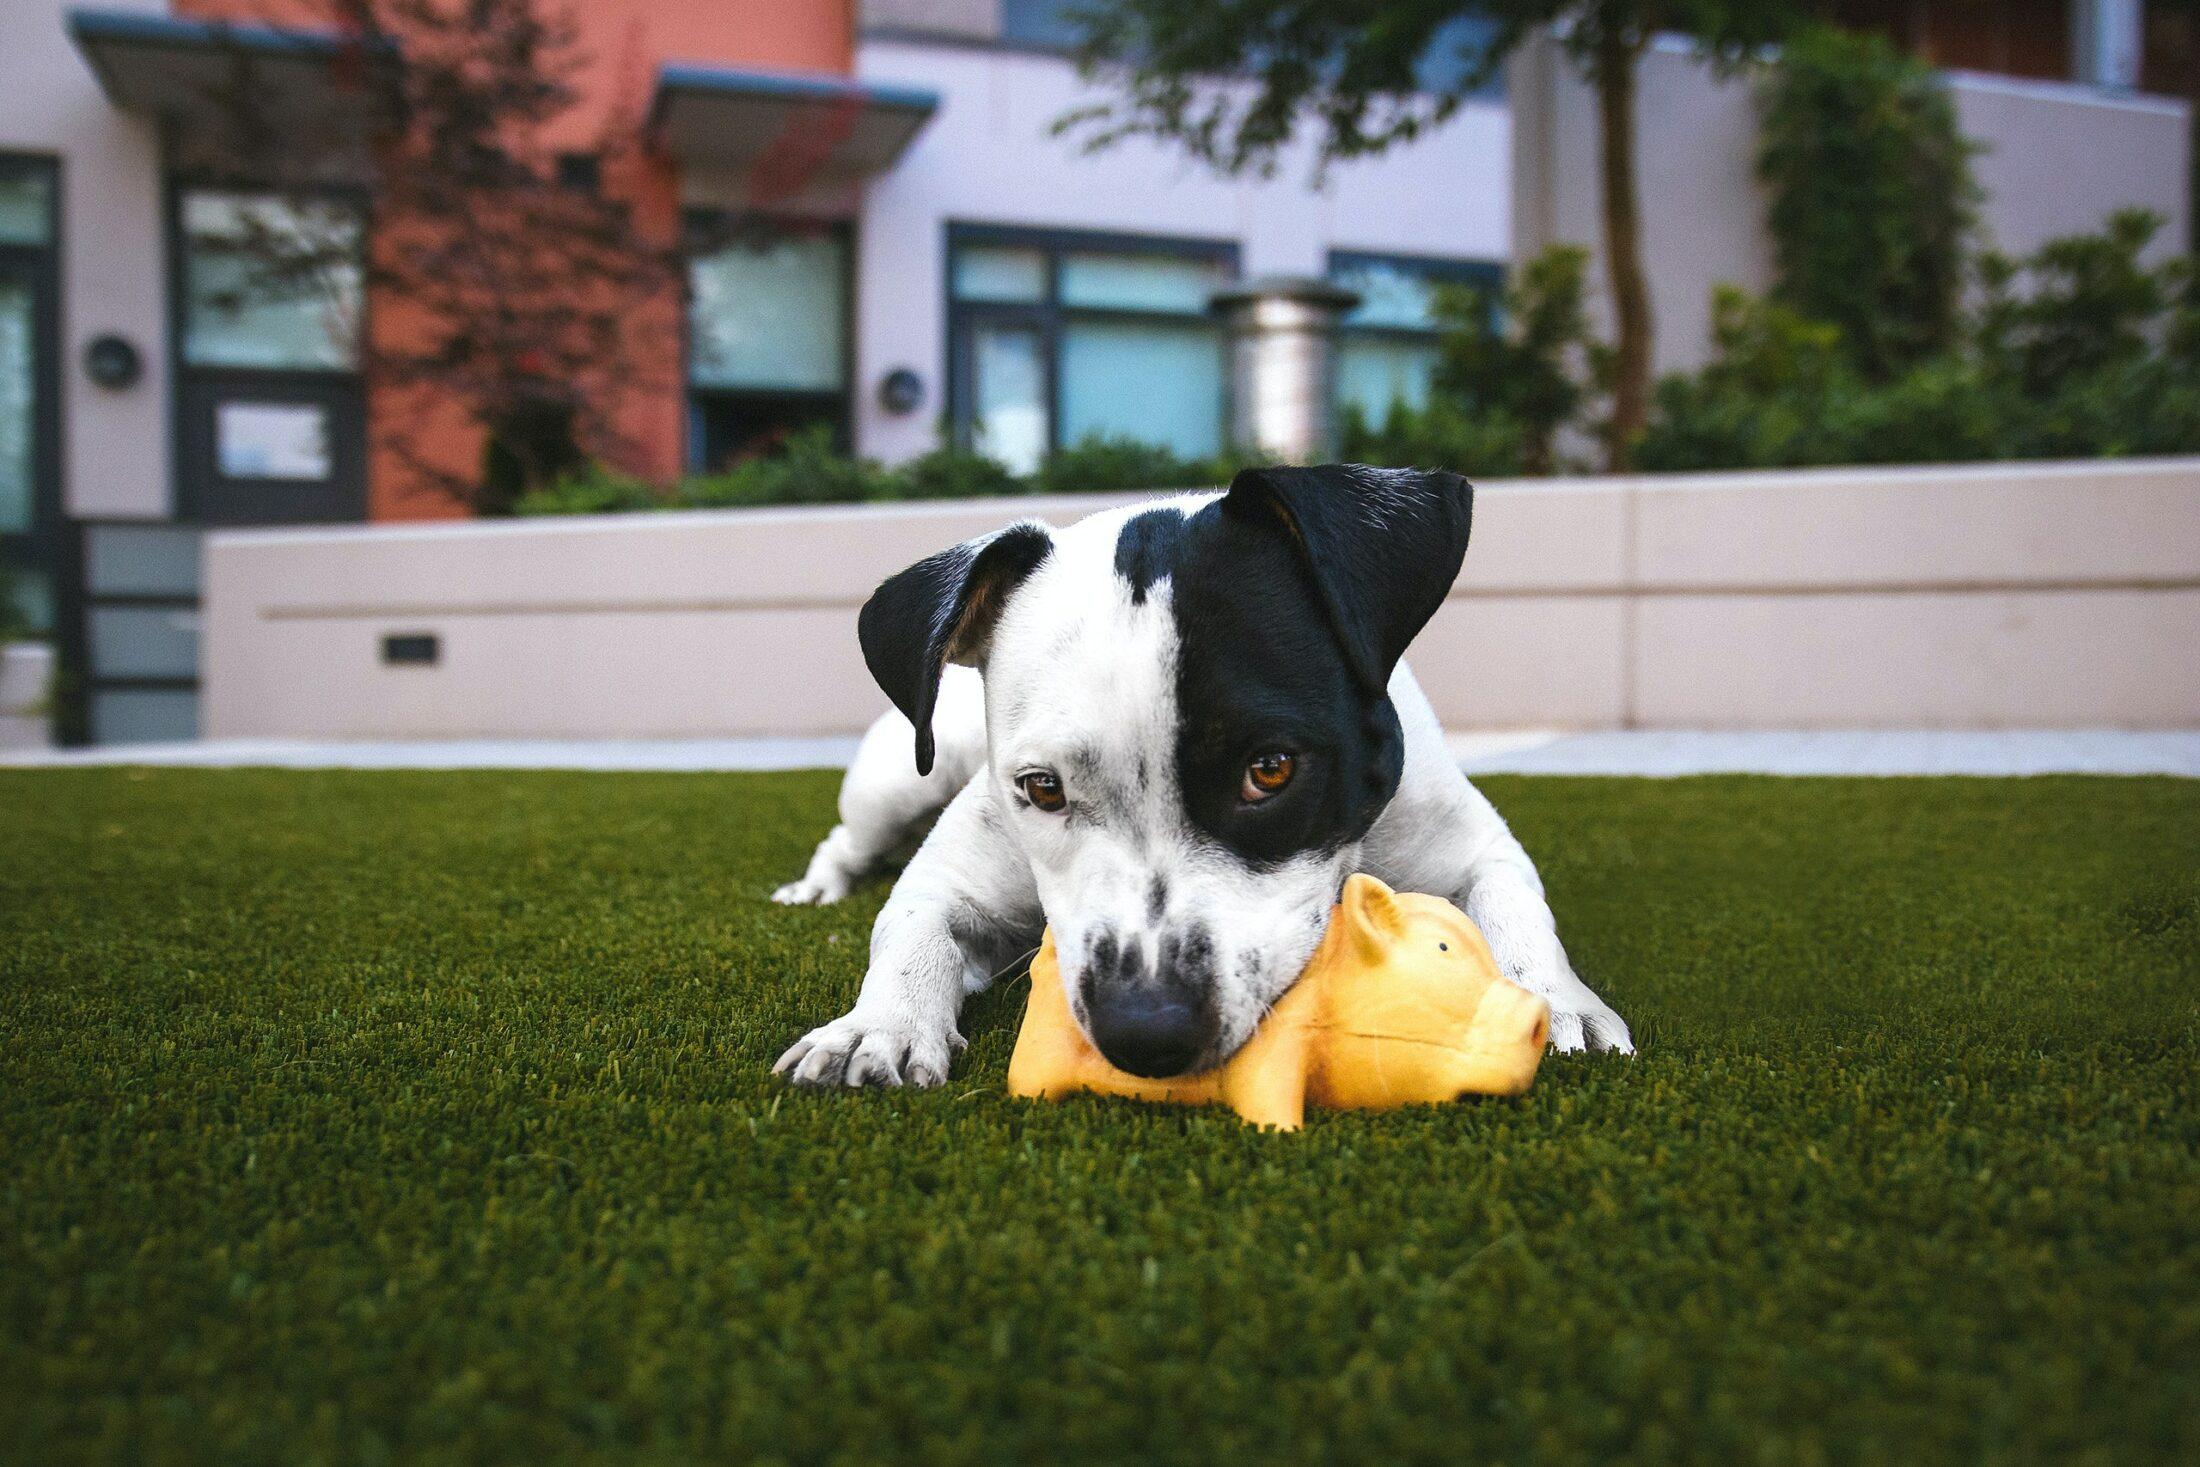 cachorro mordendo brinquedo barulhento na grama